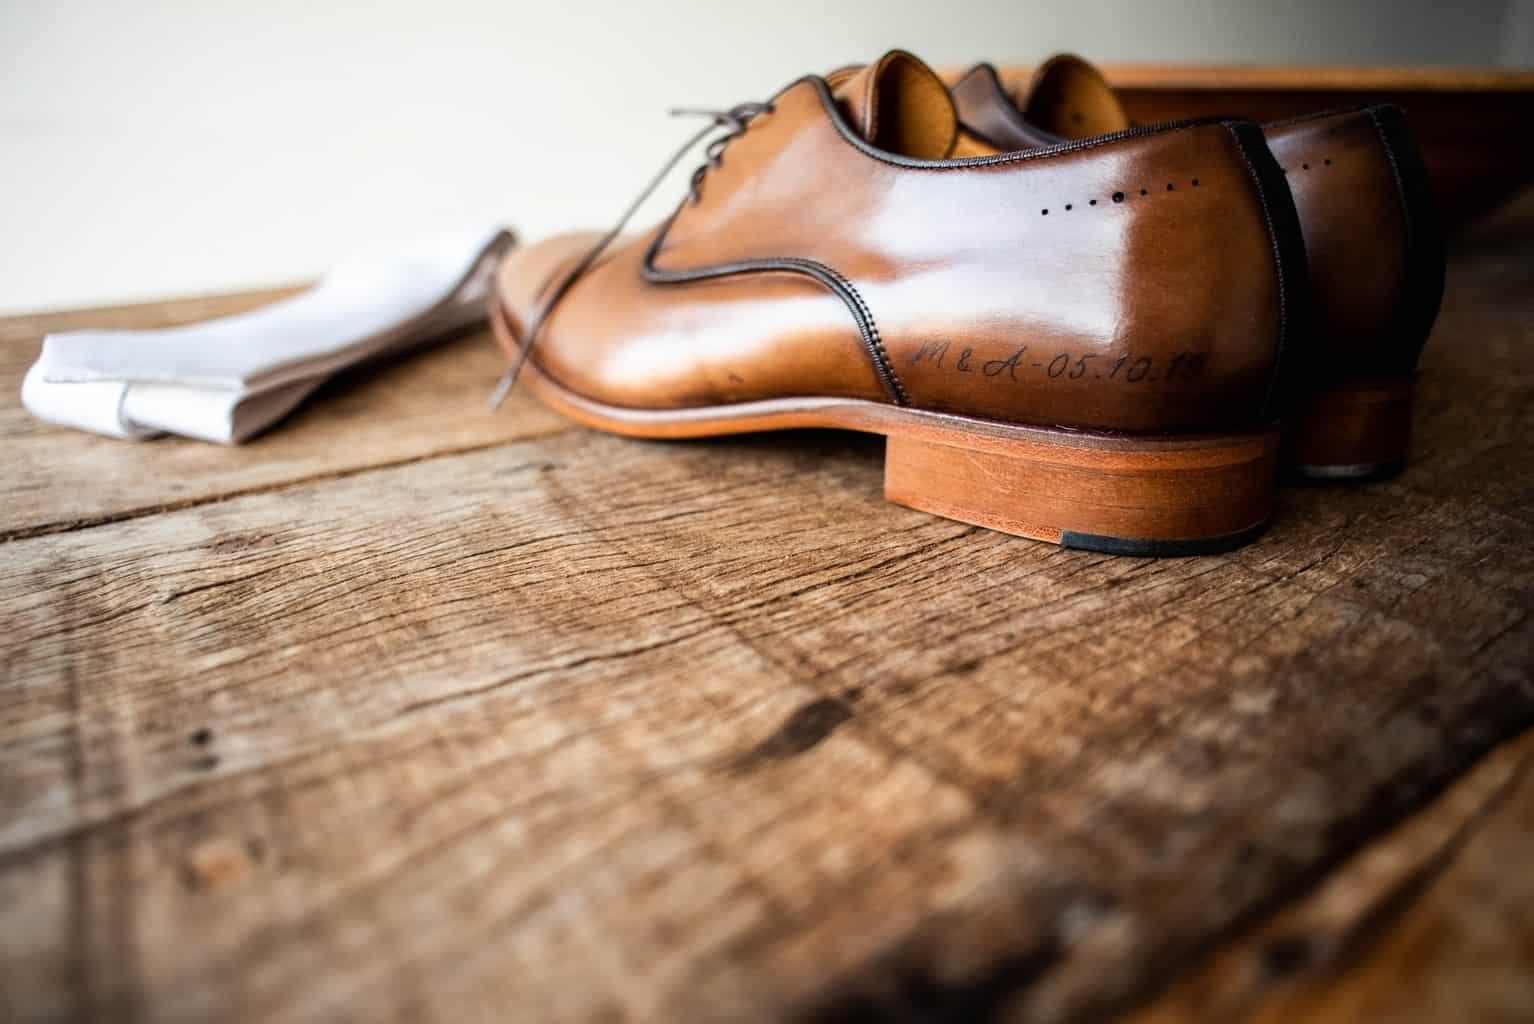 Bel-Benkler-eventos-Casamento-Ariane-e-Matheus-cerimonia-decoracao-contemporanea-fotografia-Rafael-Bigarelli-noivos-na-pista-Spazio-Giardini-15